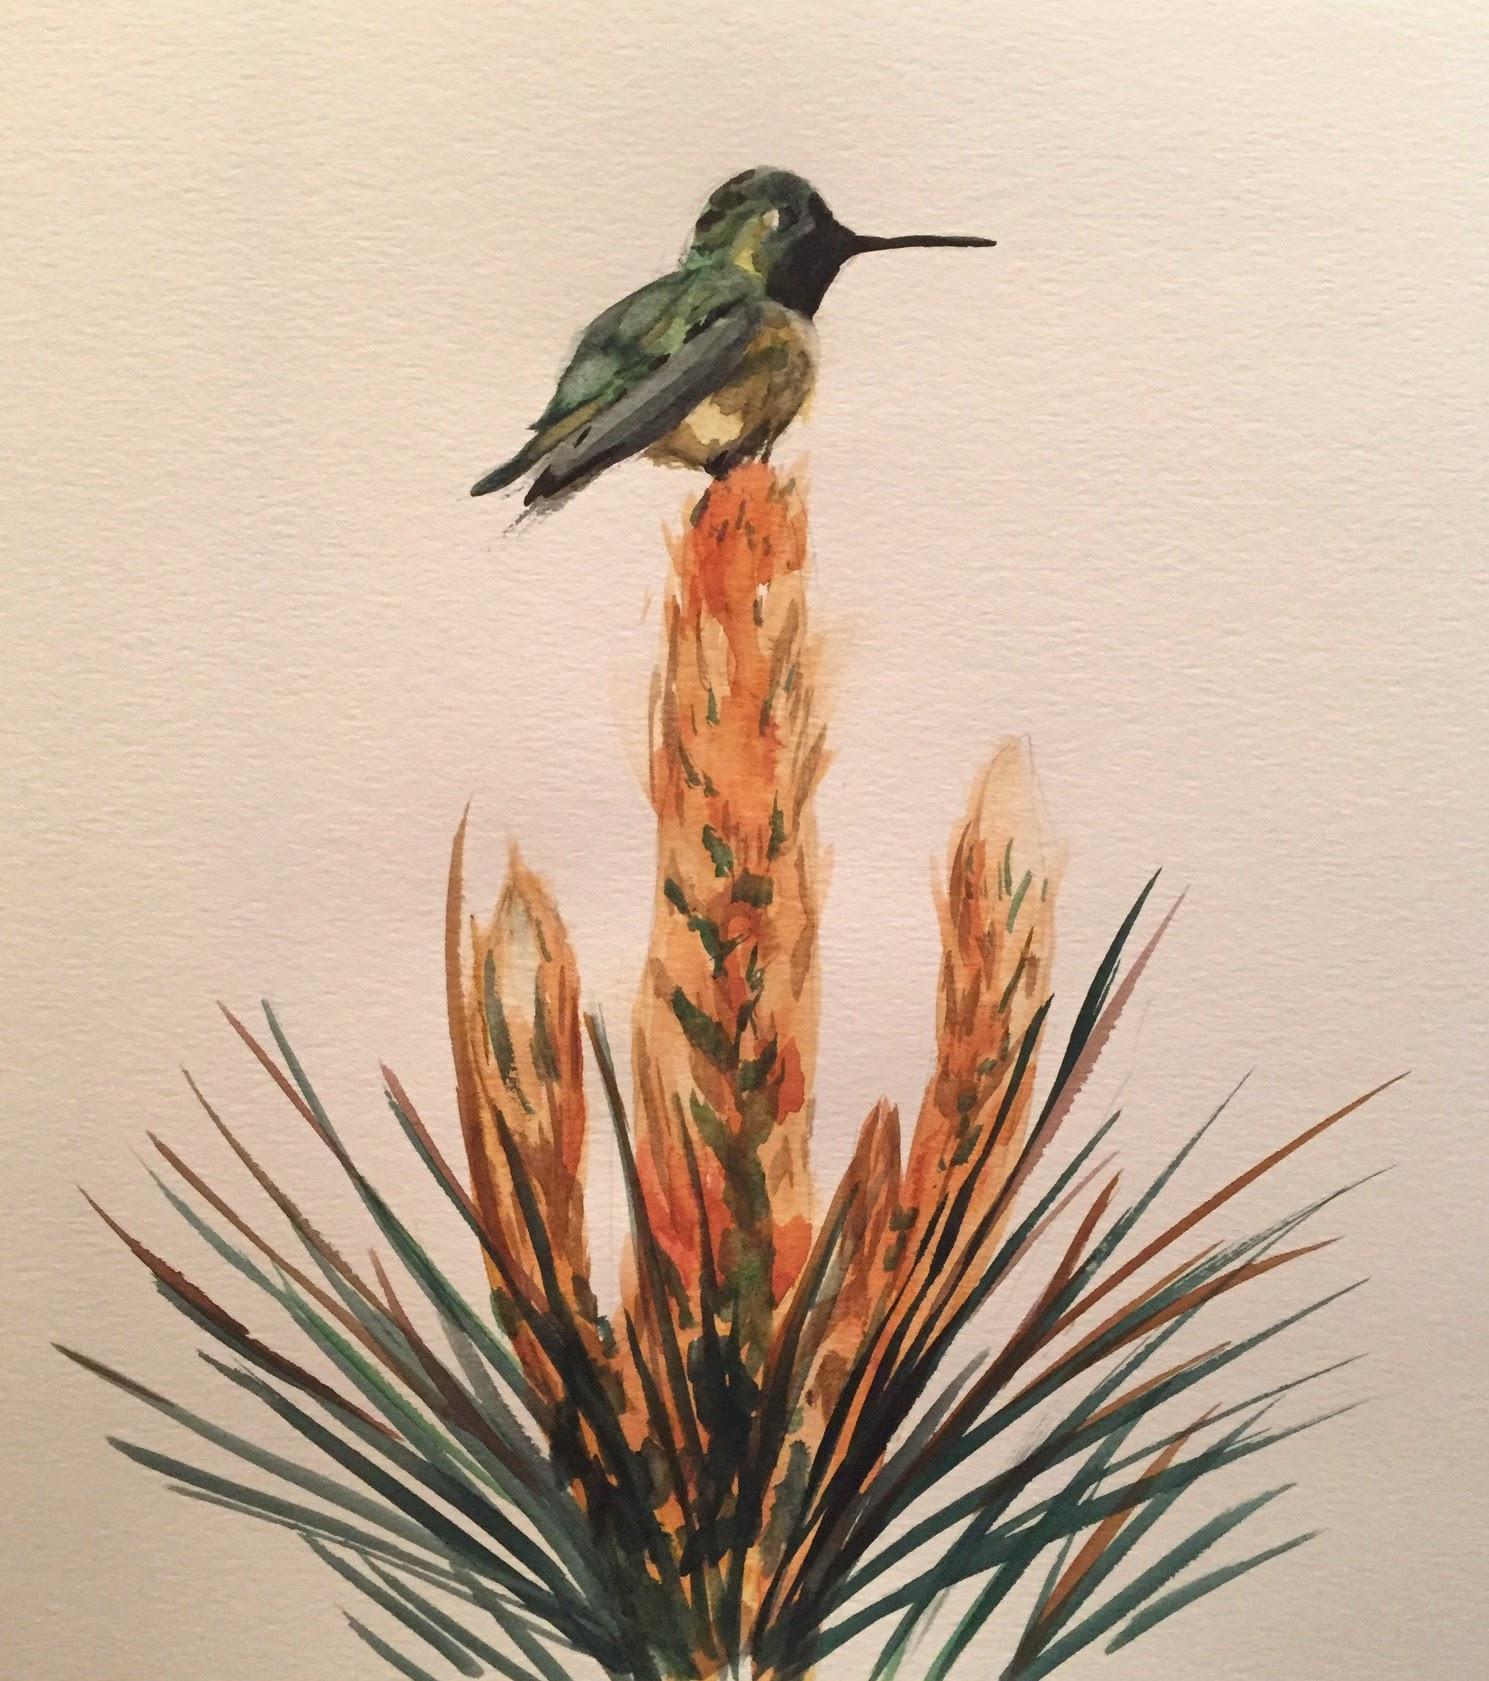 Yucca Perch